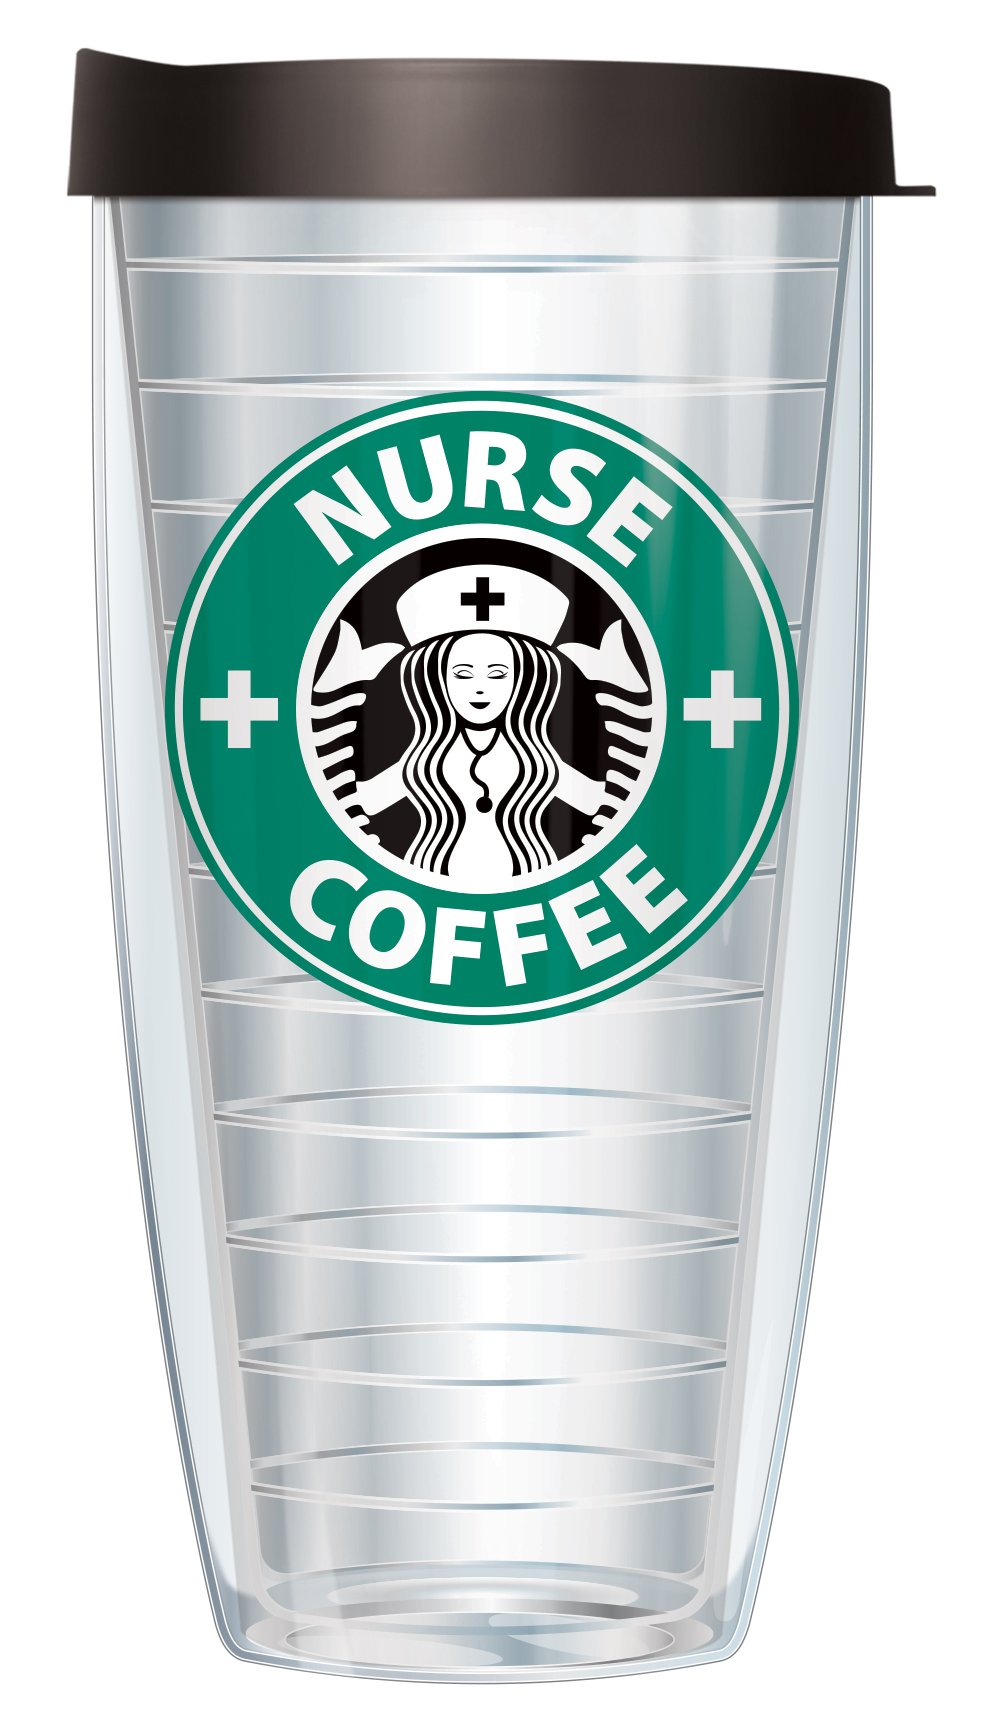 Nurse Coffee Parady 22oz Mug Tumbler Cup with Lid